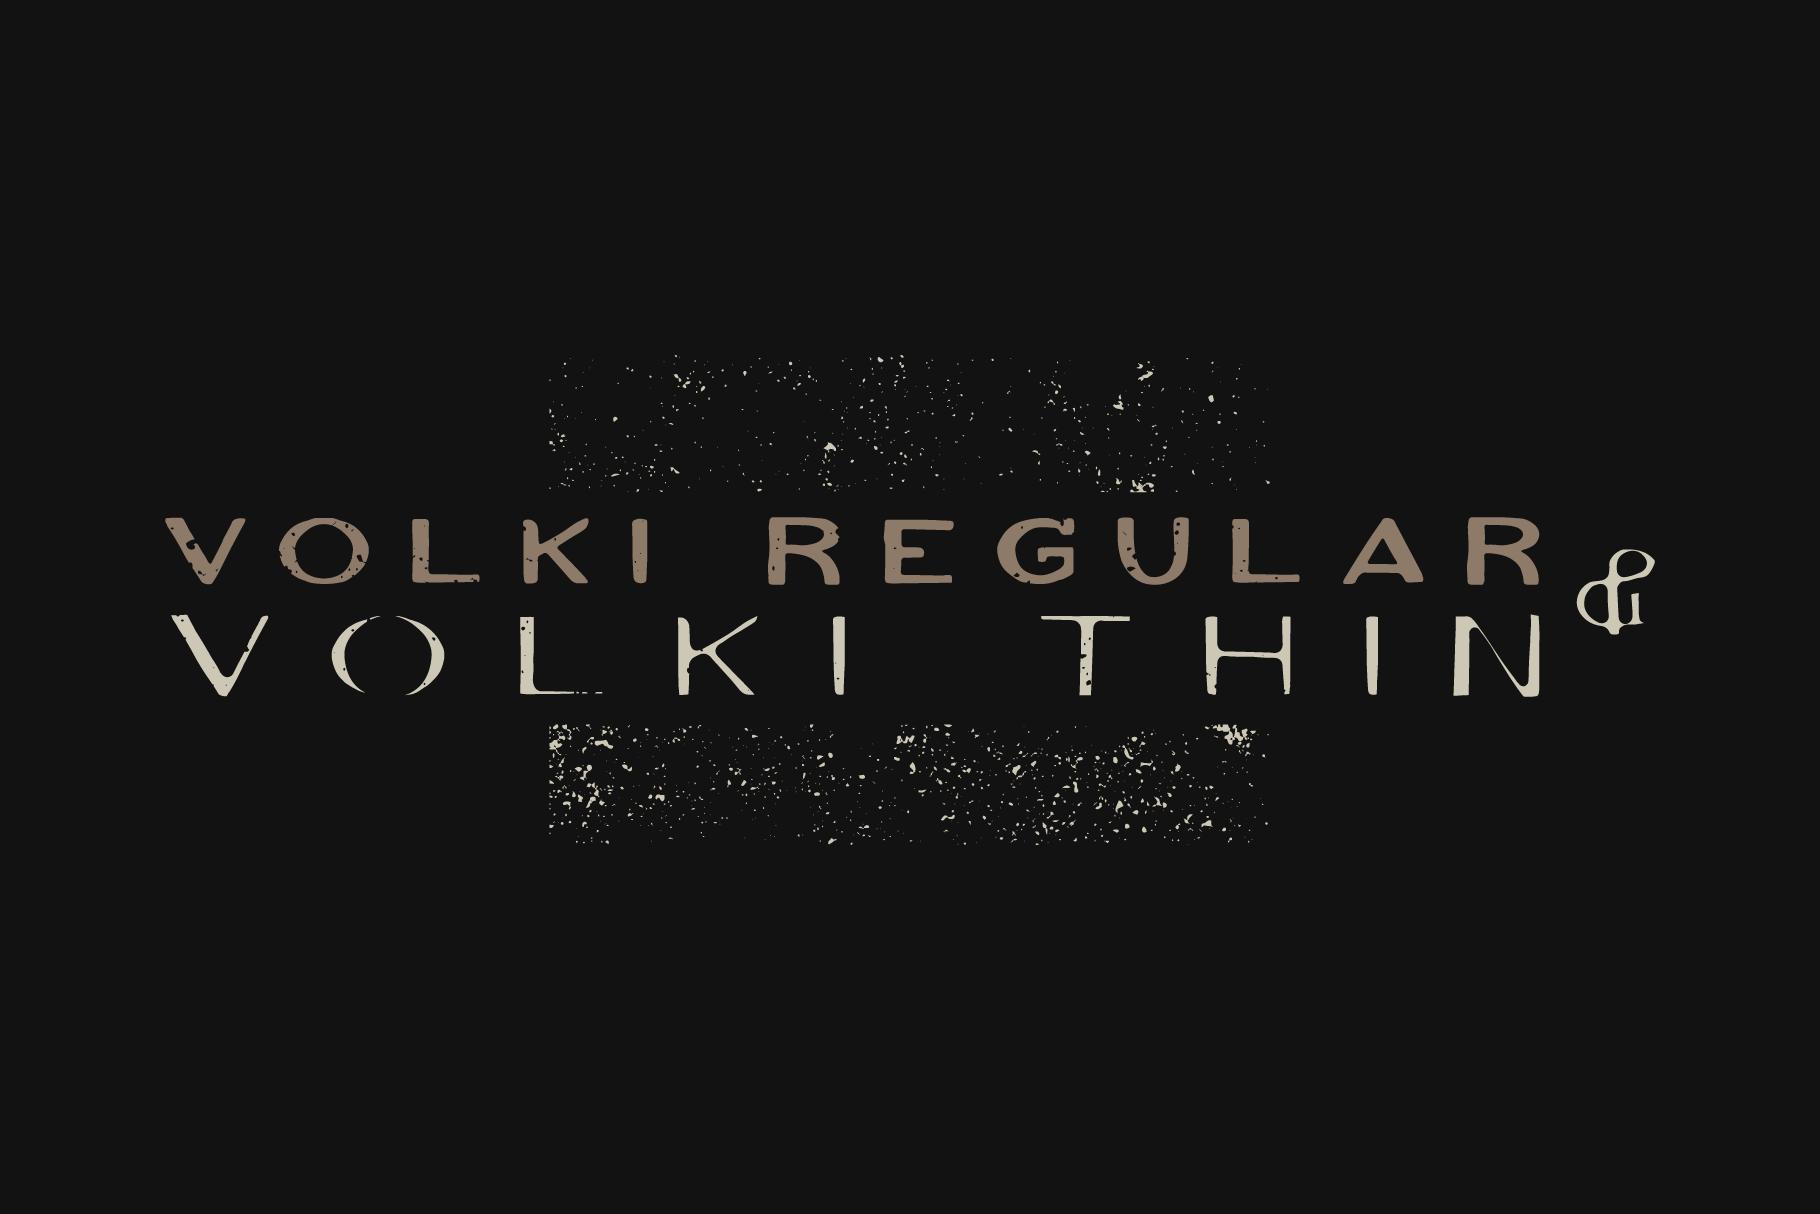 VOLKI - Handwritten Vintage Typeface example image 5